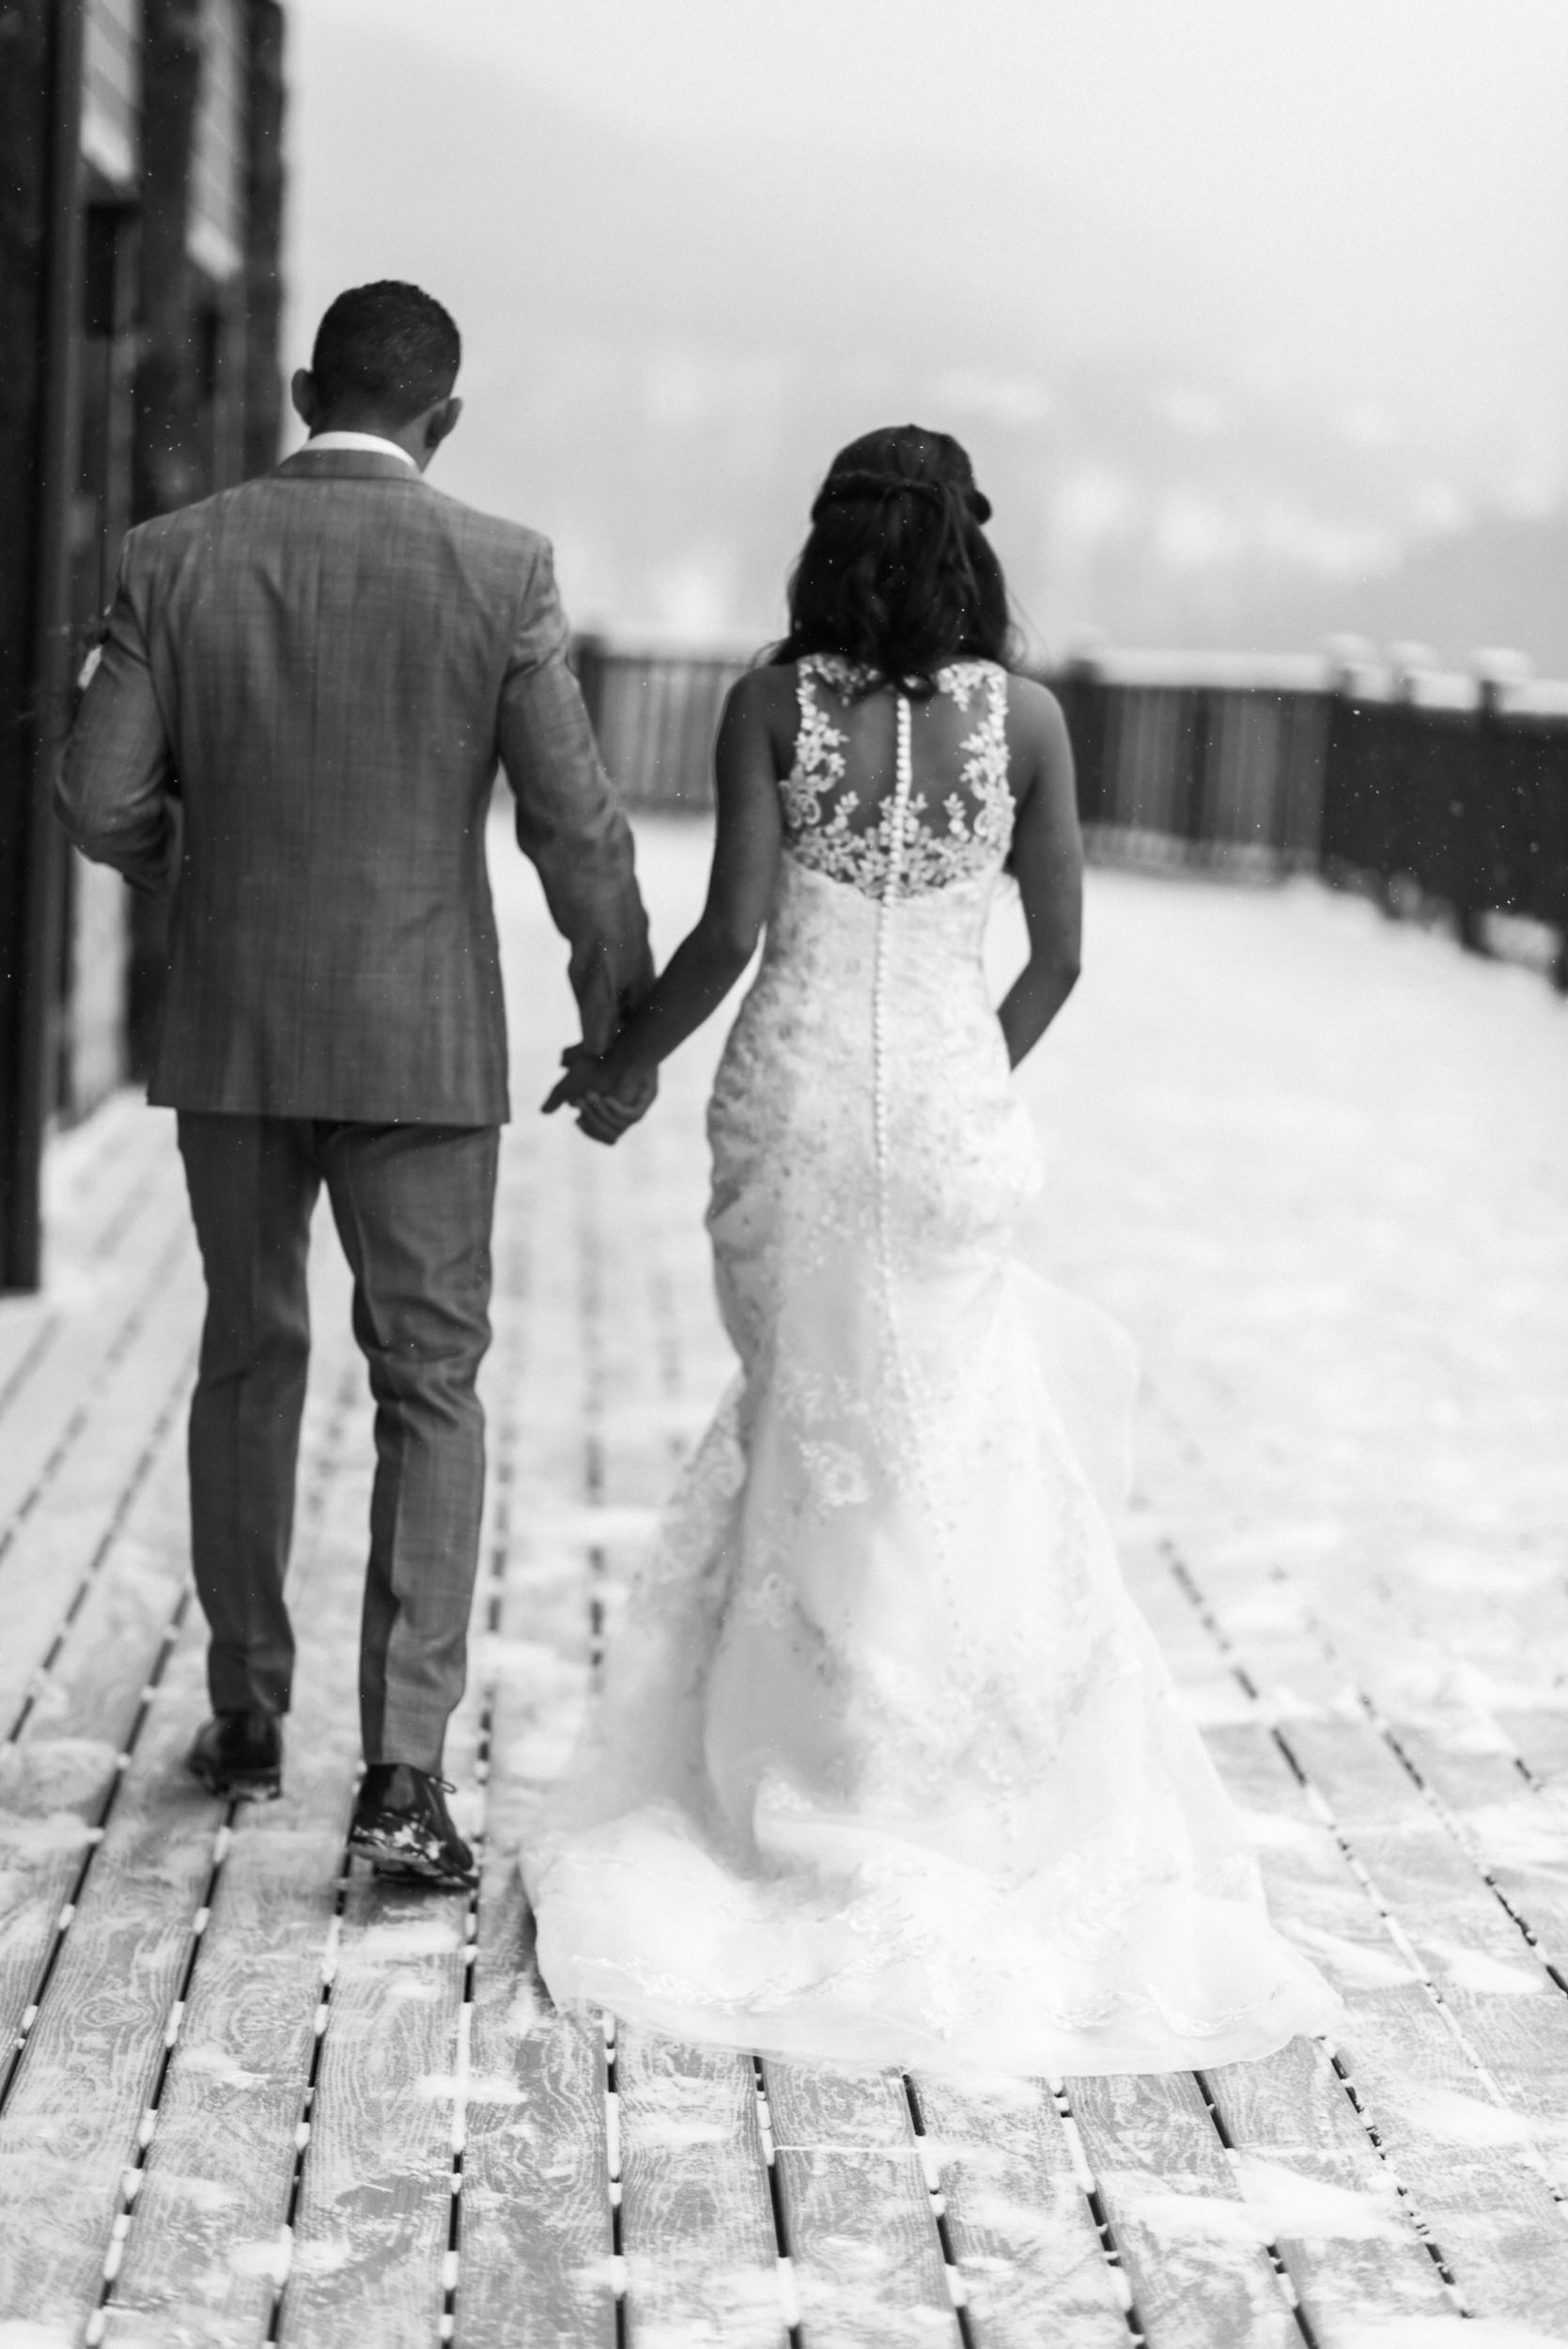 Colorado-Wedding-Photographer-Breckinridge-Mountain-Adventure-Elopement-39.jpg